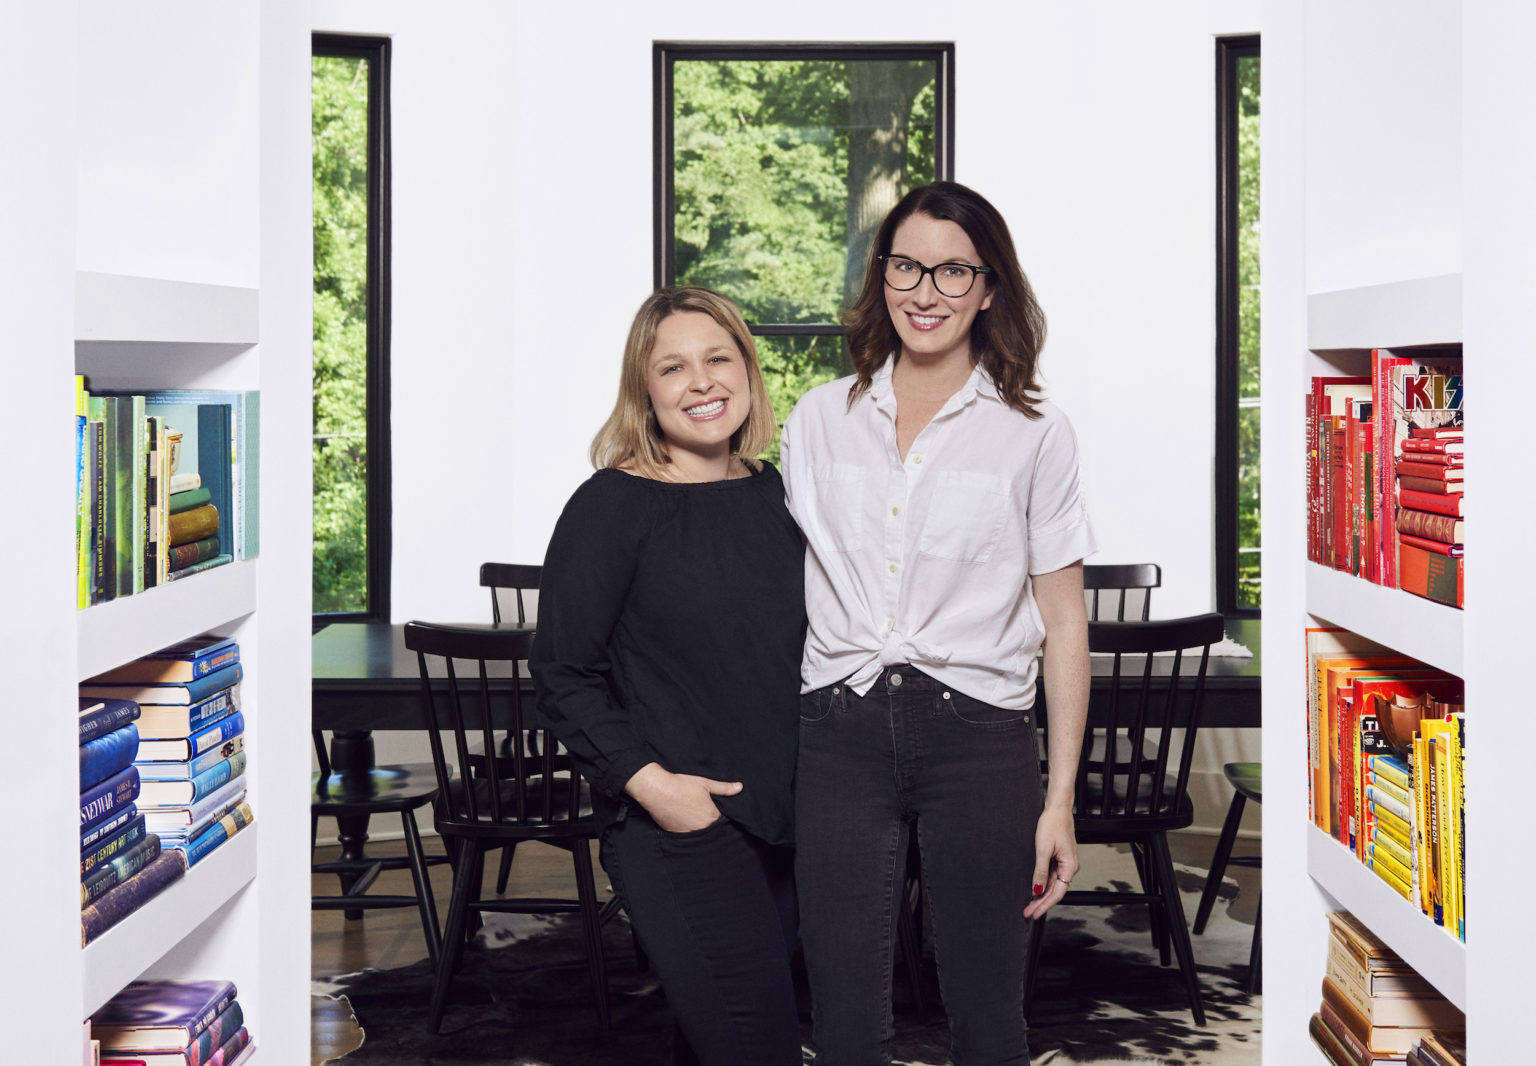 The Home Edit's Joanna Teplin and Clea Shearer